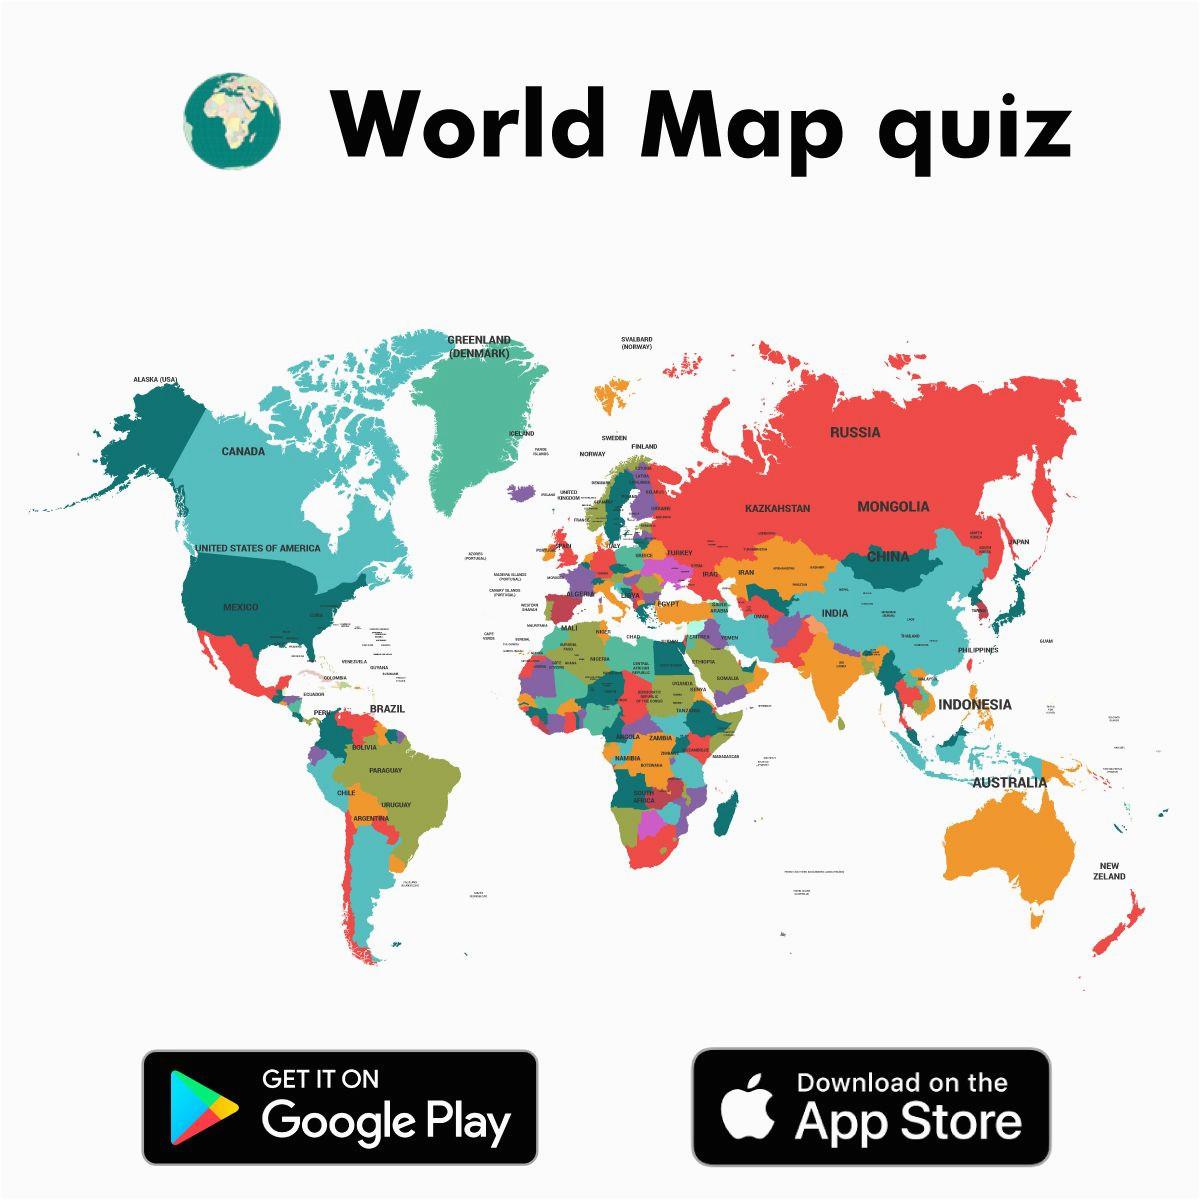 world map quiz app is an interesting app developed for kids